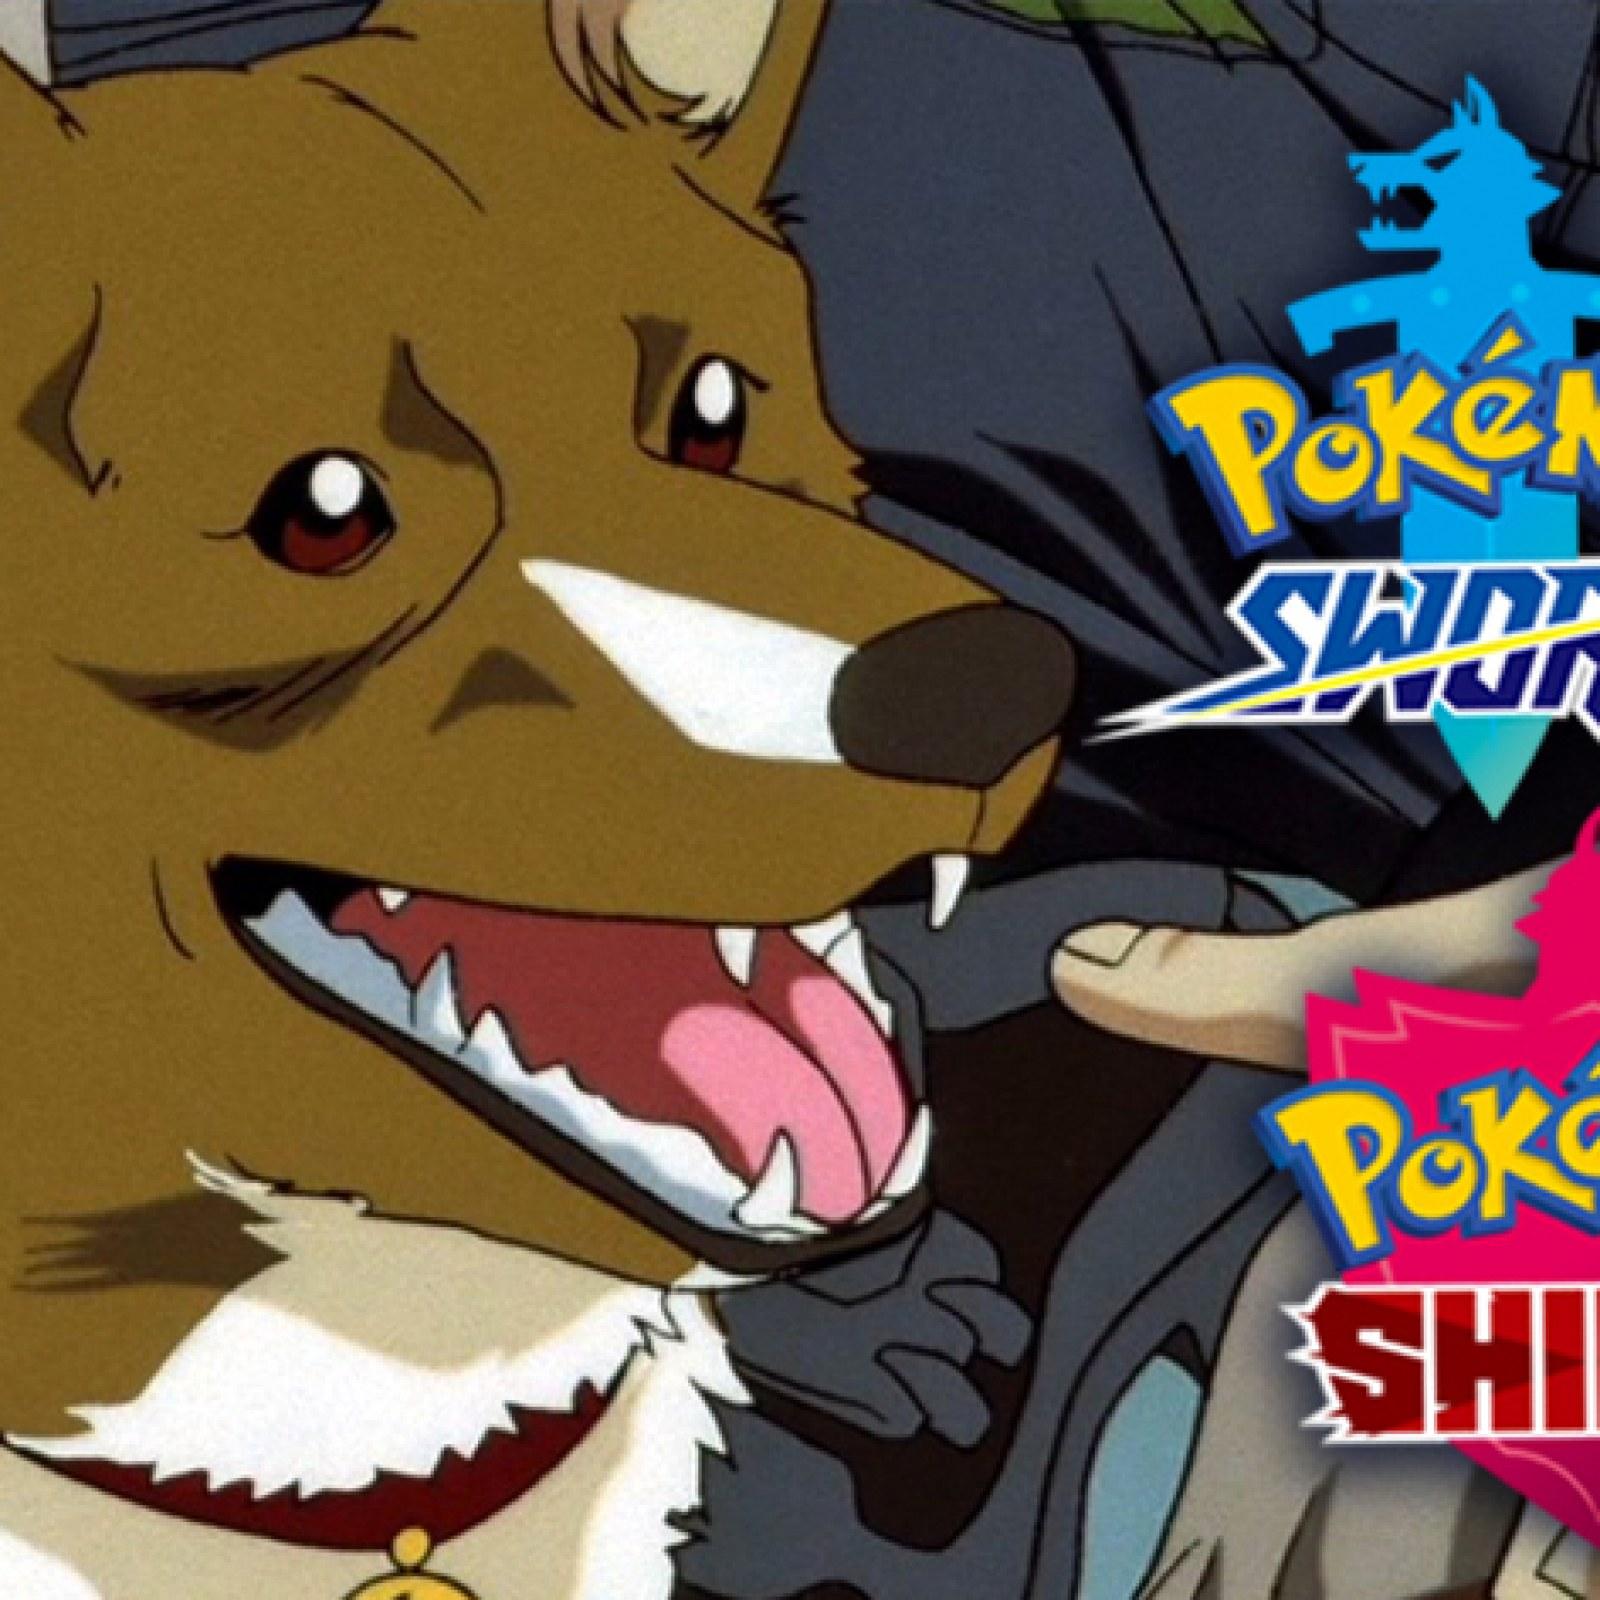 Two New Pokemon Discovered In Pokemon Sword And Shield E3 2019 Demo